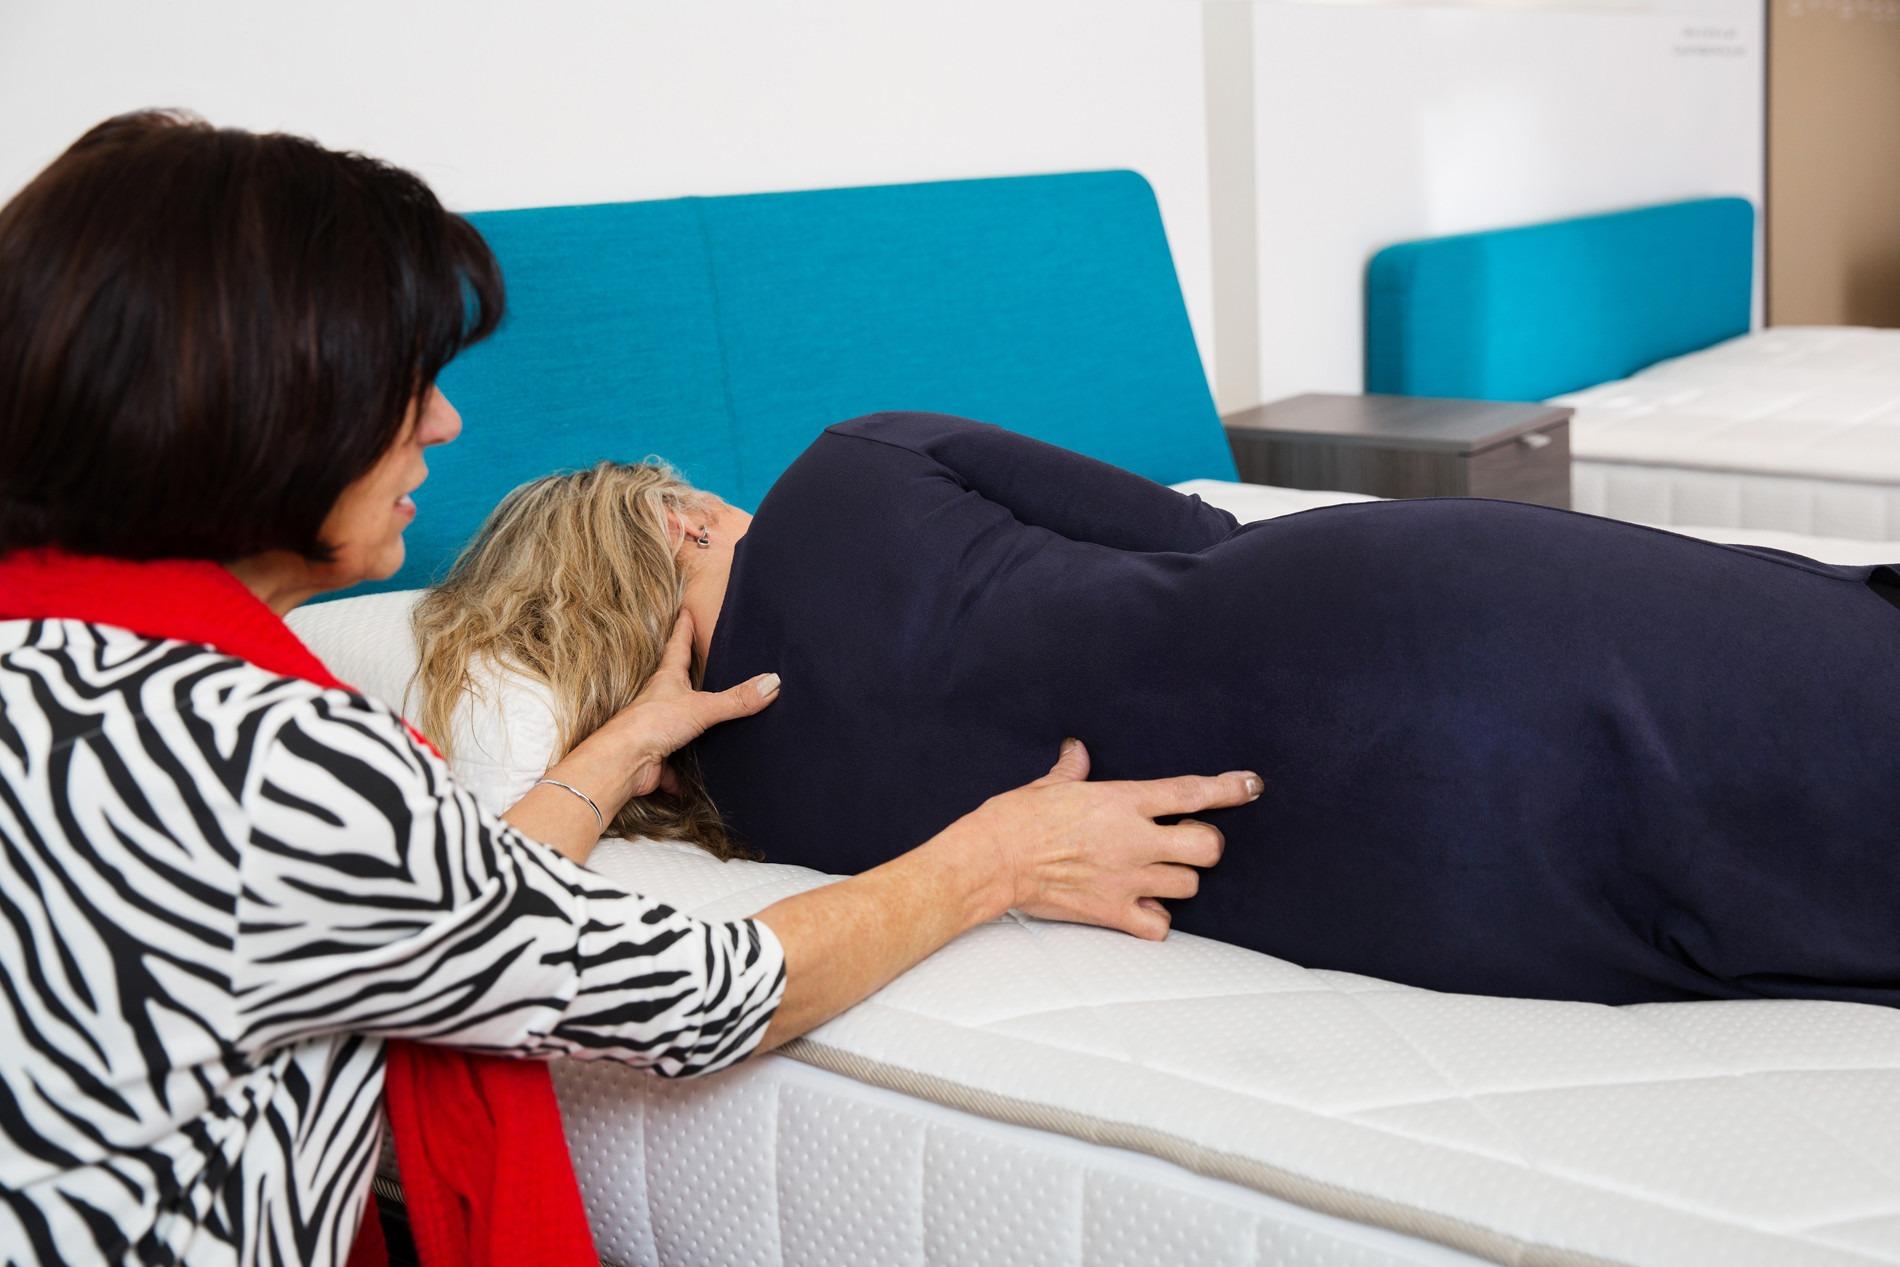 buy mattress amersfoort auping